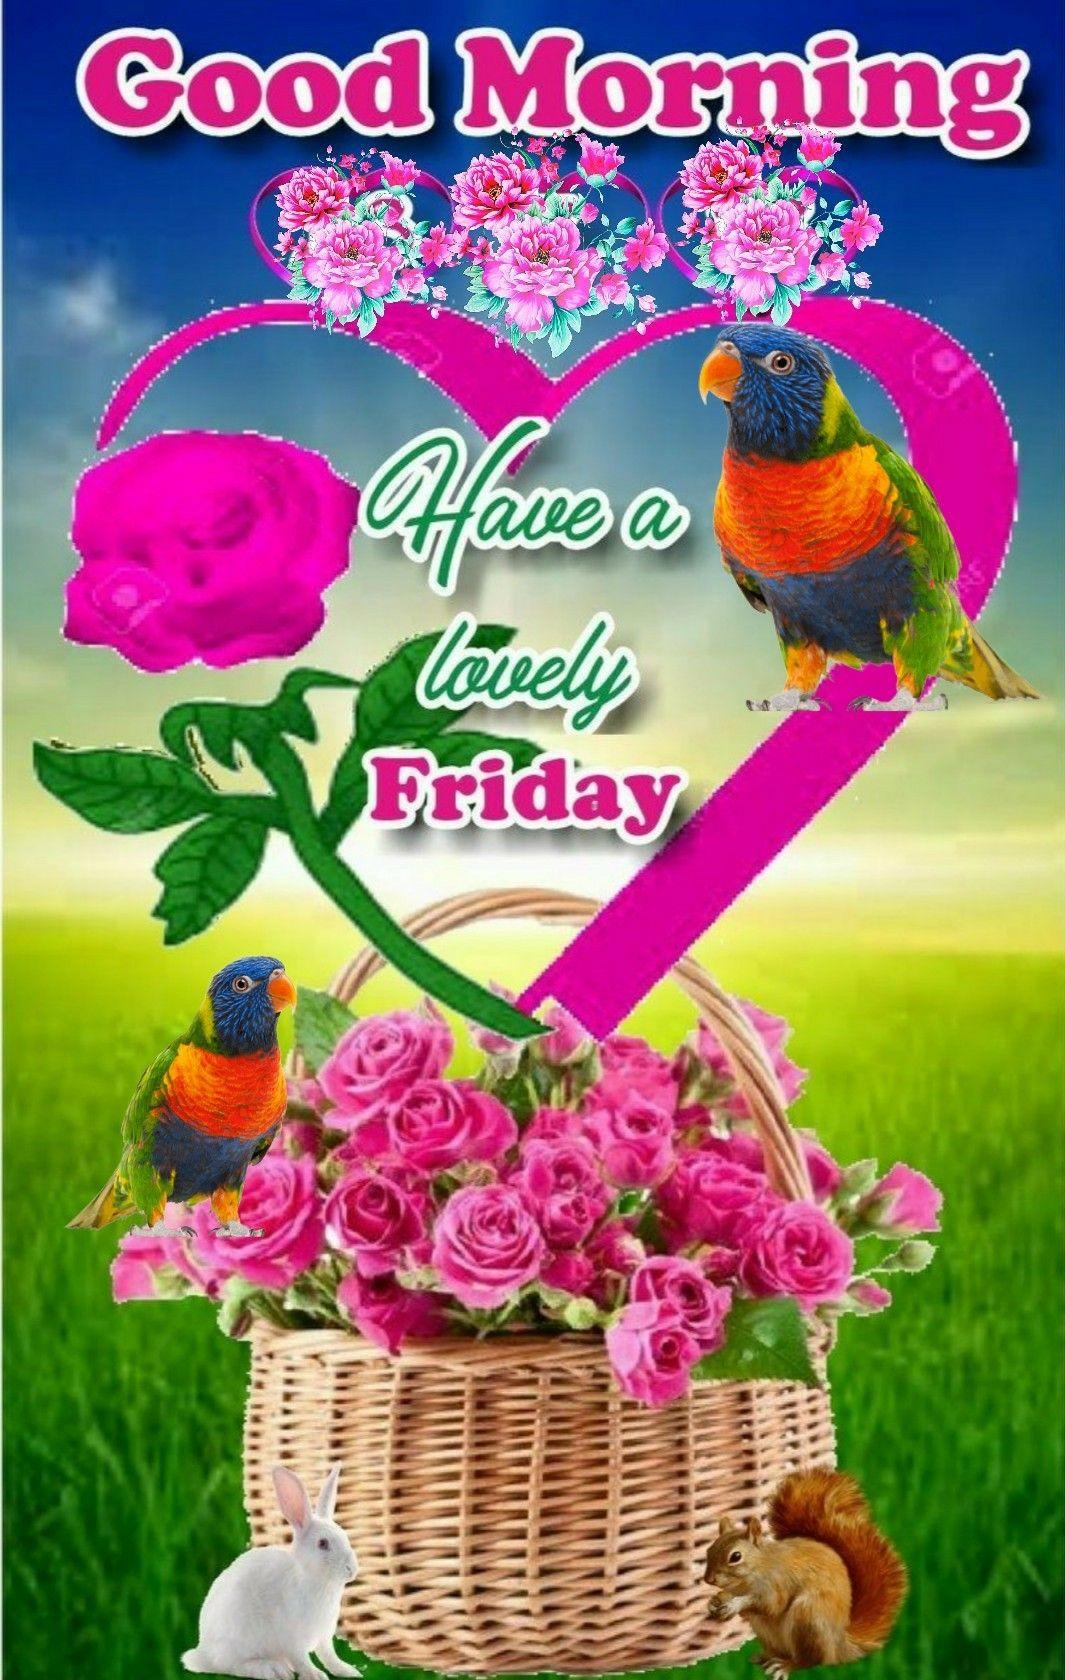 Pin By Moustafa Halik On Sharechat Images Good Morning Happy Friday Good Morning Friday Friday Wishes